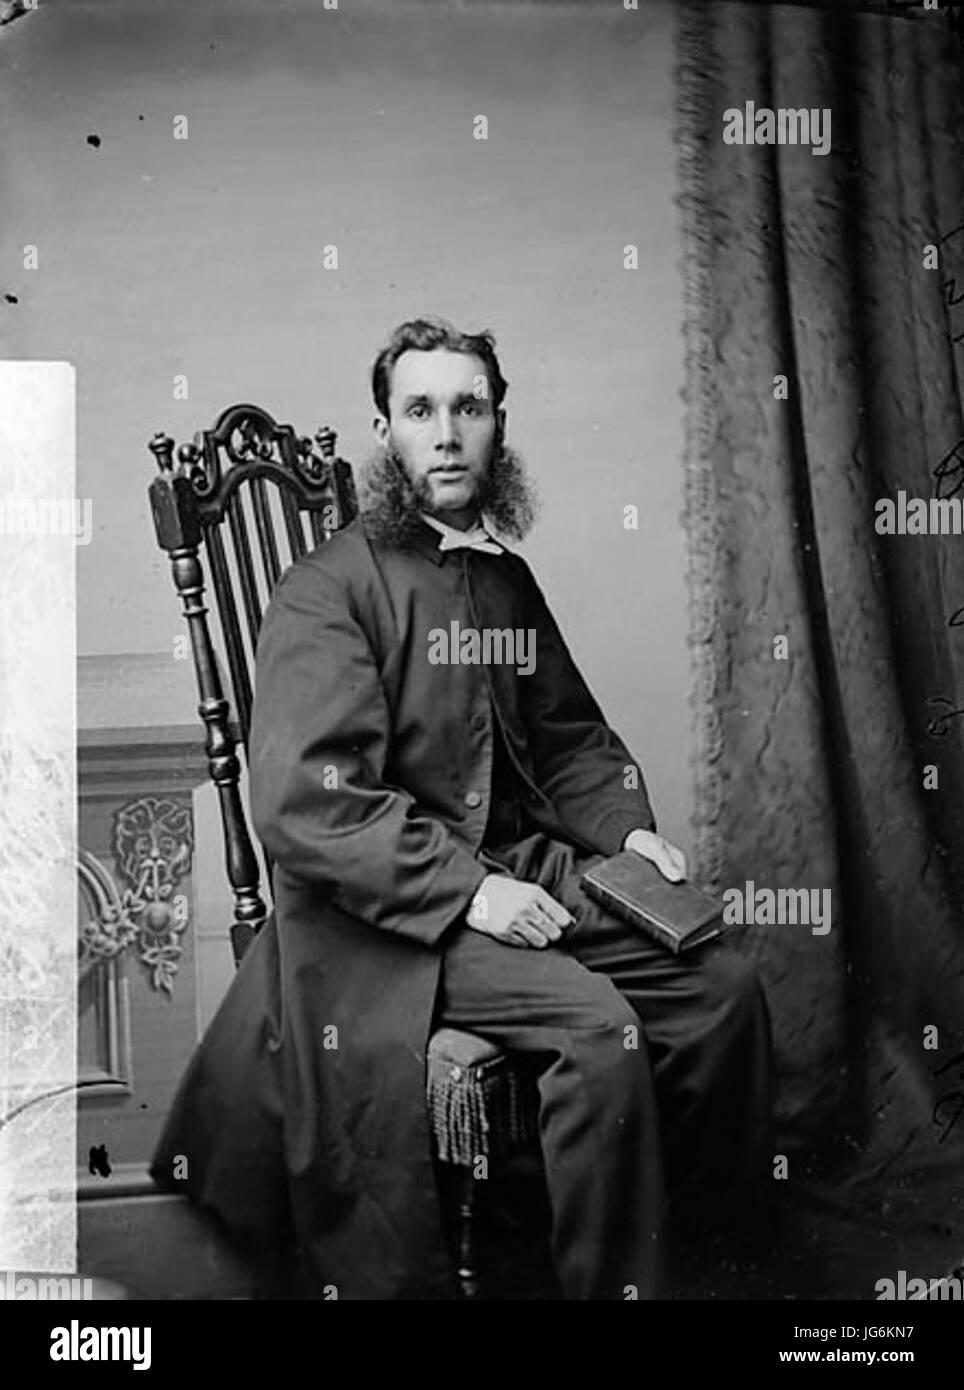 Revd John Wyndham Lewis 28Homo Ddu 1837-9529 NLW3362028 - Stock Image